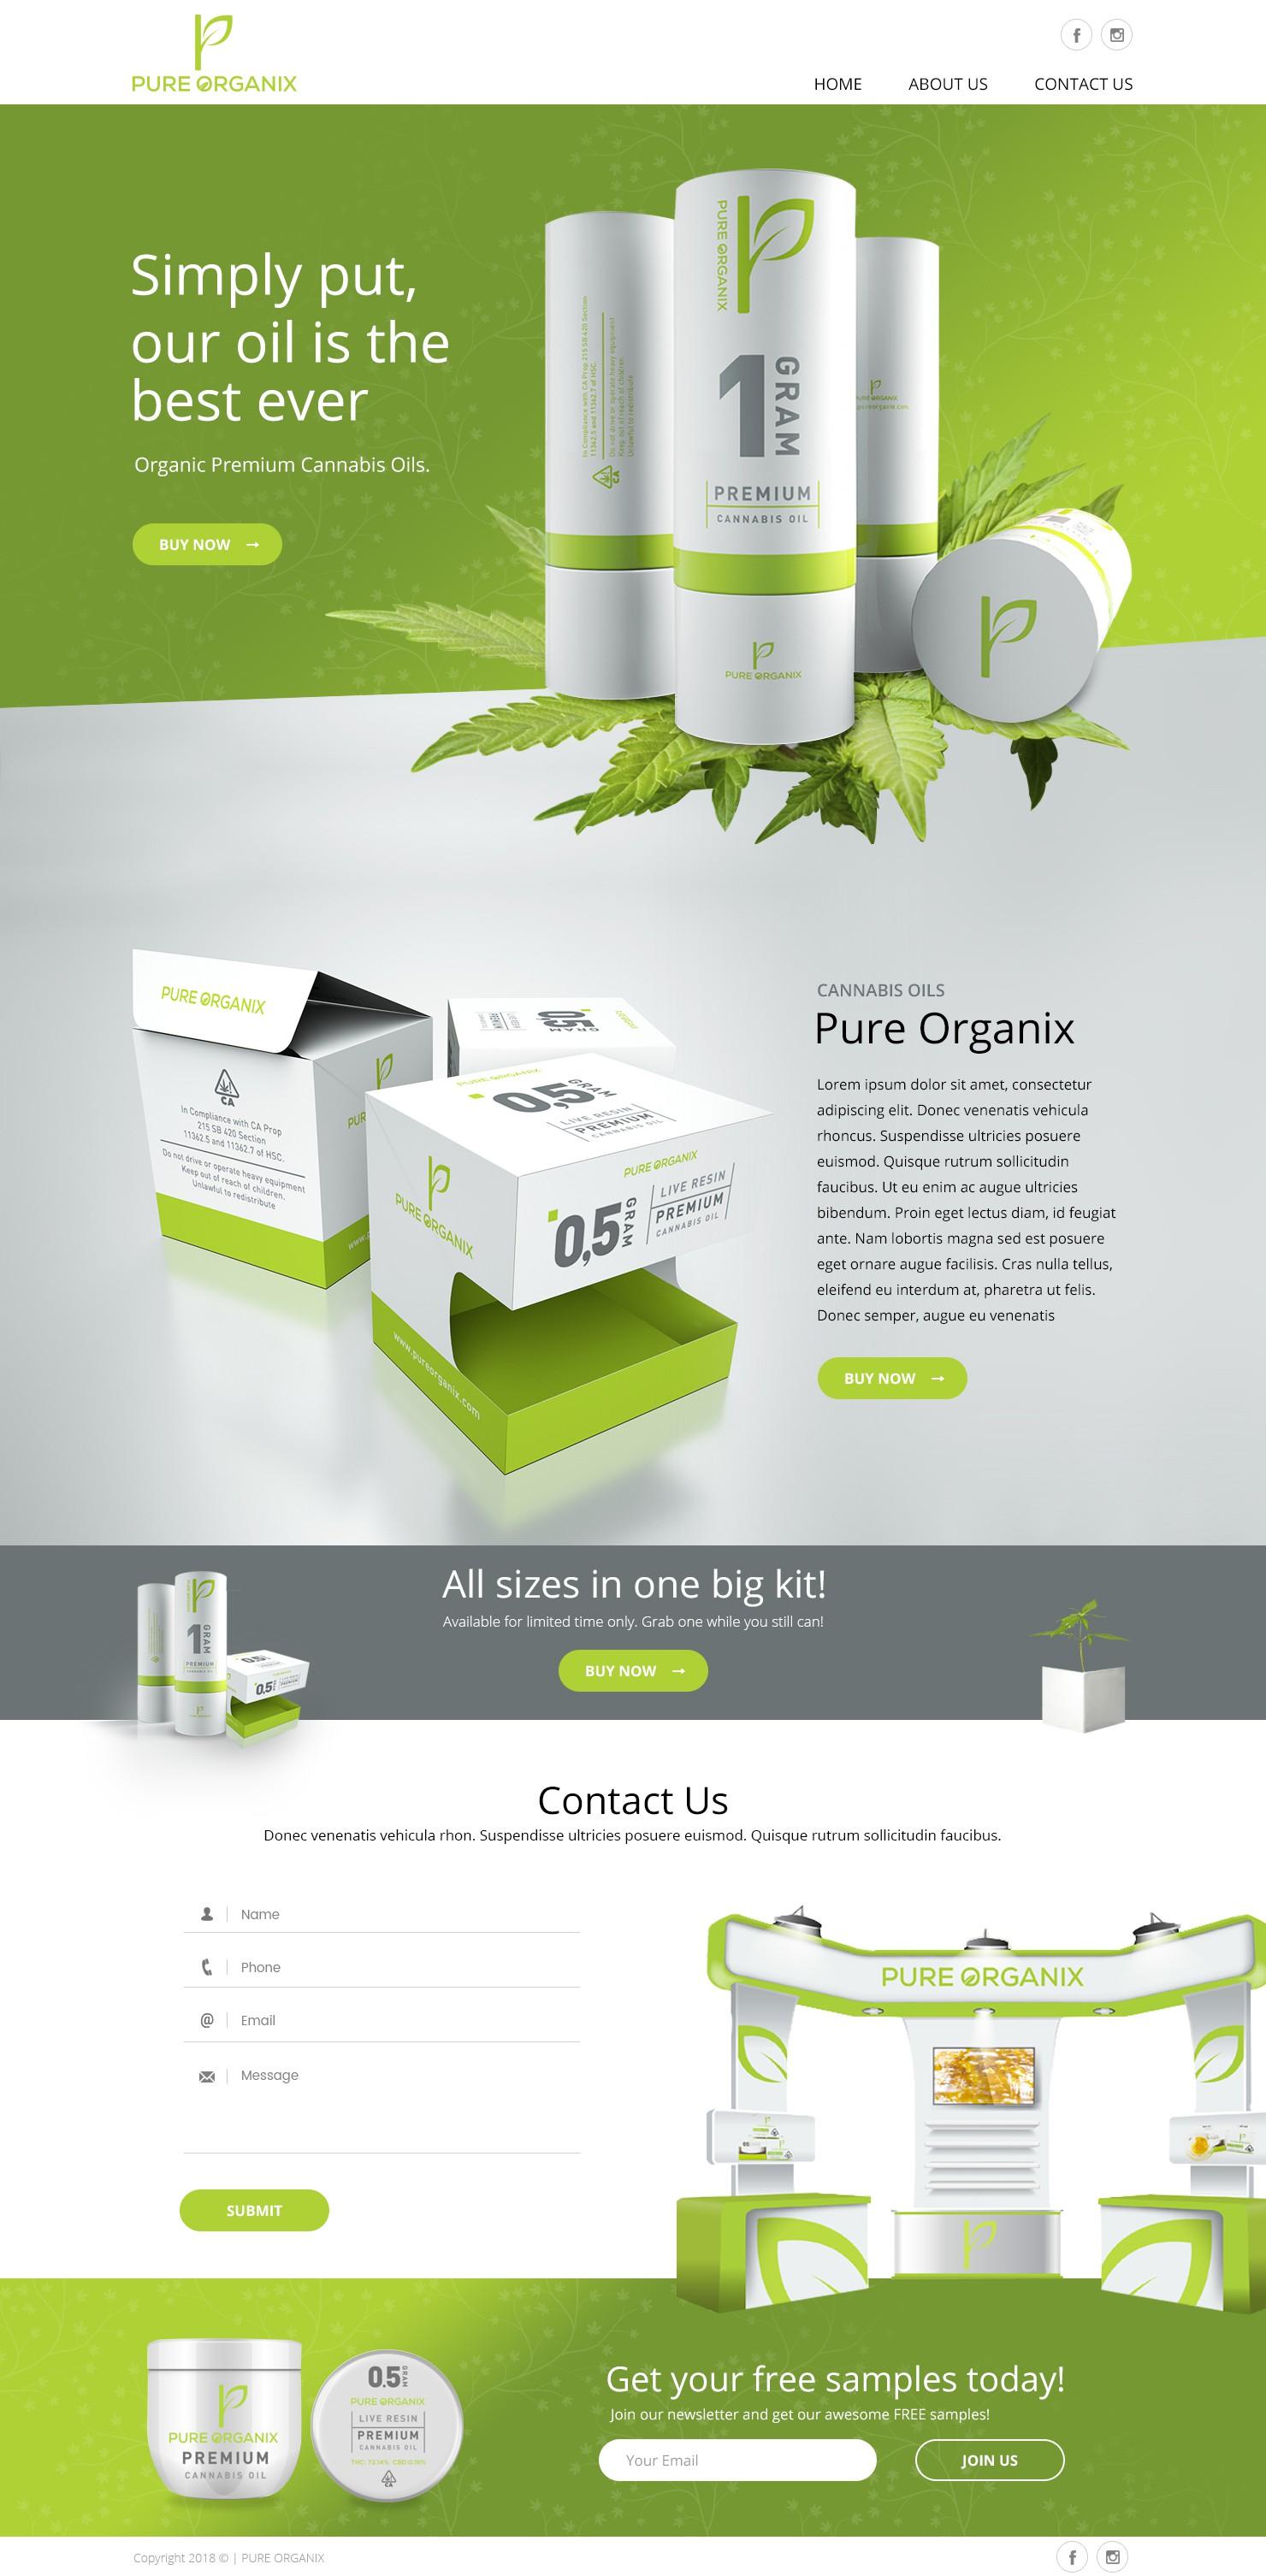 Pure Organix Website